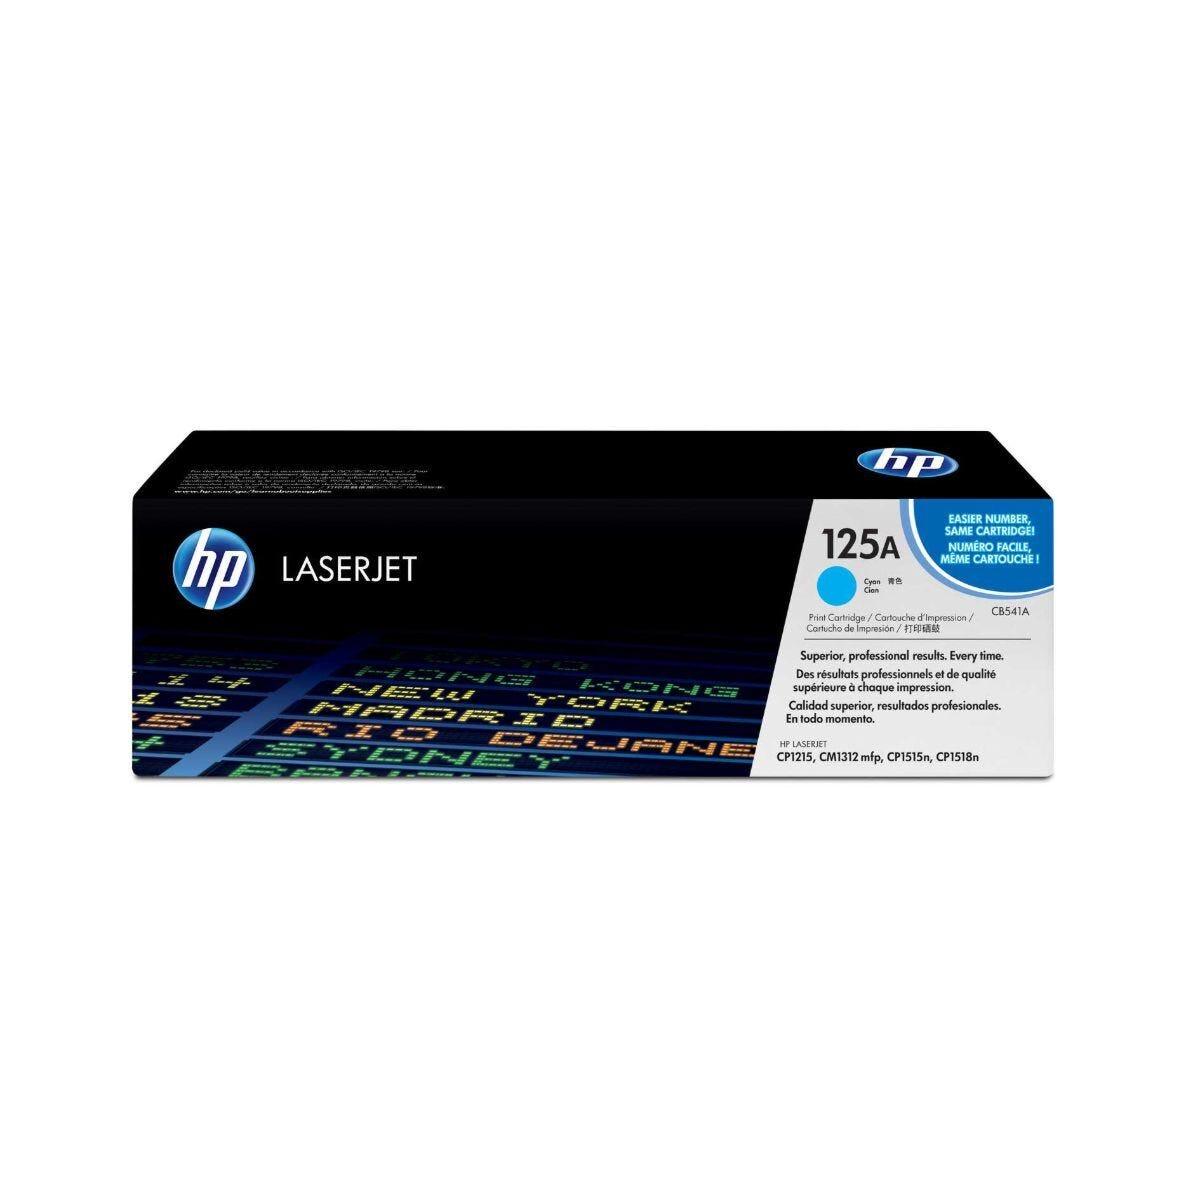 HP 125A CB541A Laser Printer Ink Toner Cartridge